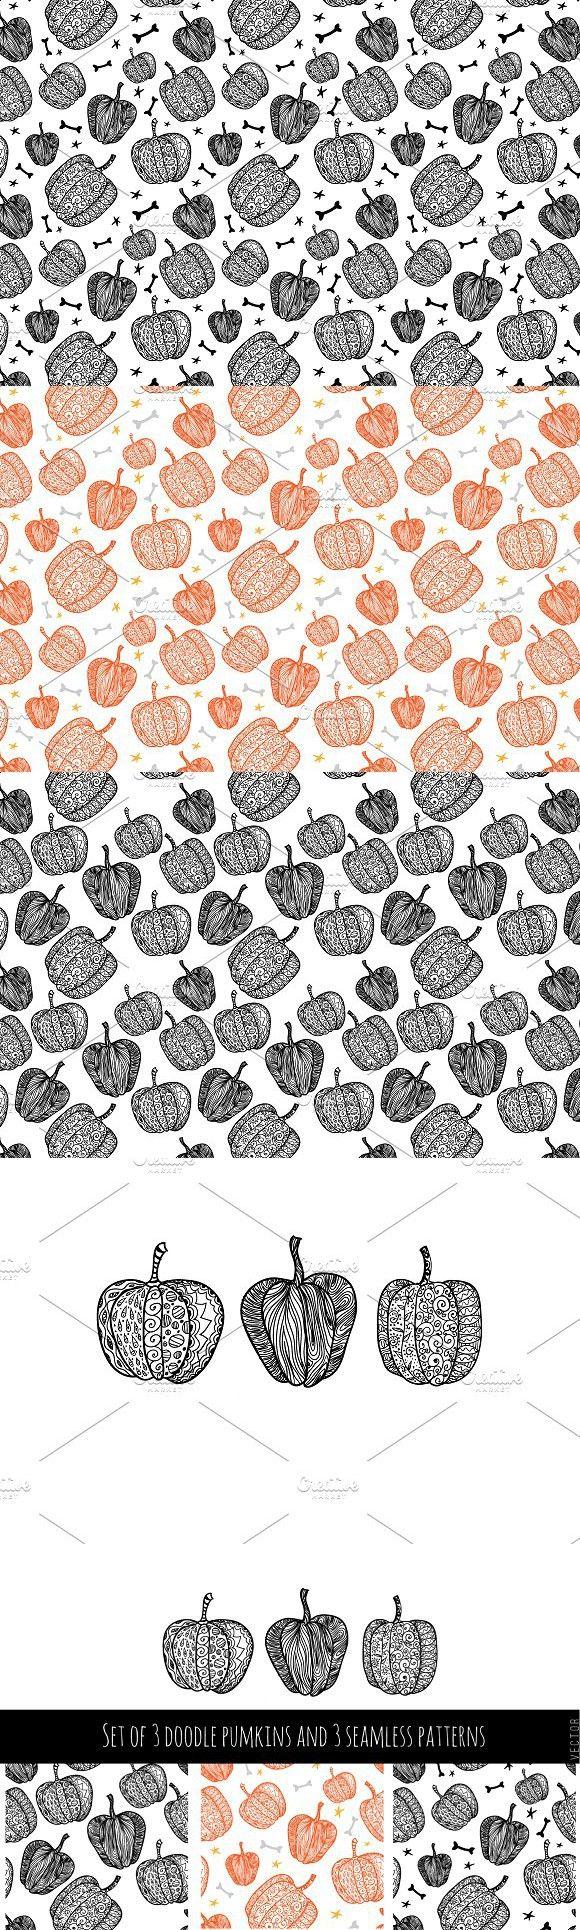 Set of 3 pumpkins and 3 patterns #halloween #vector